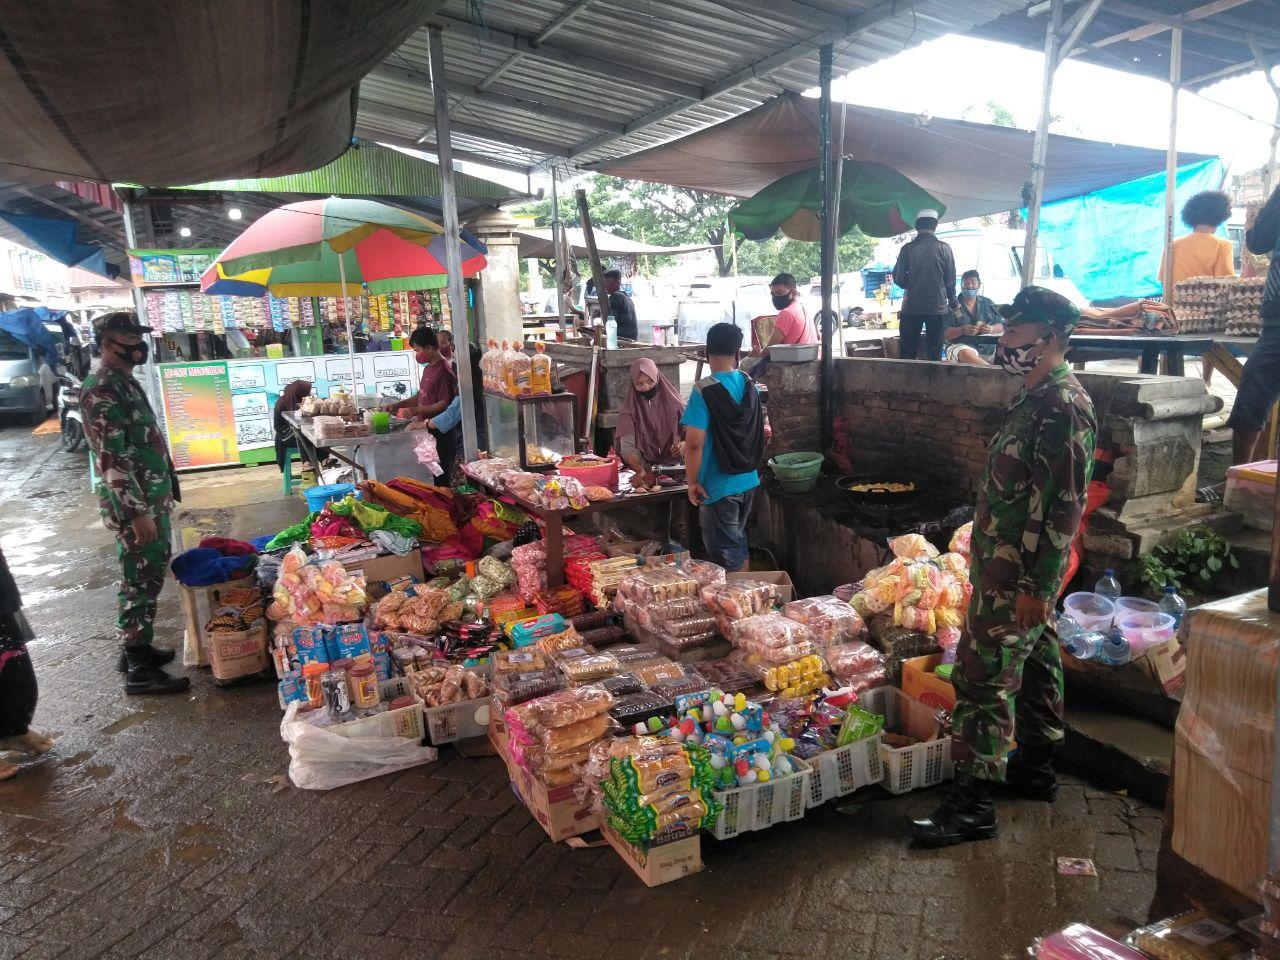 Koramil 1423 - 05 Marioriwawo Terjunkan Babinsa Untuk Patroli PDPK di Pasar Tradisional